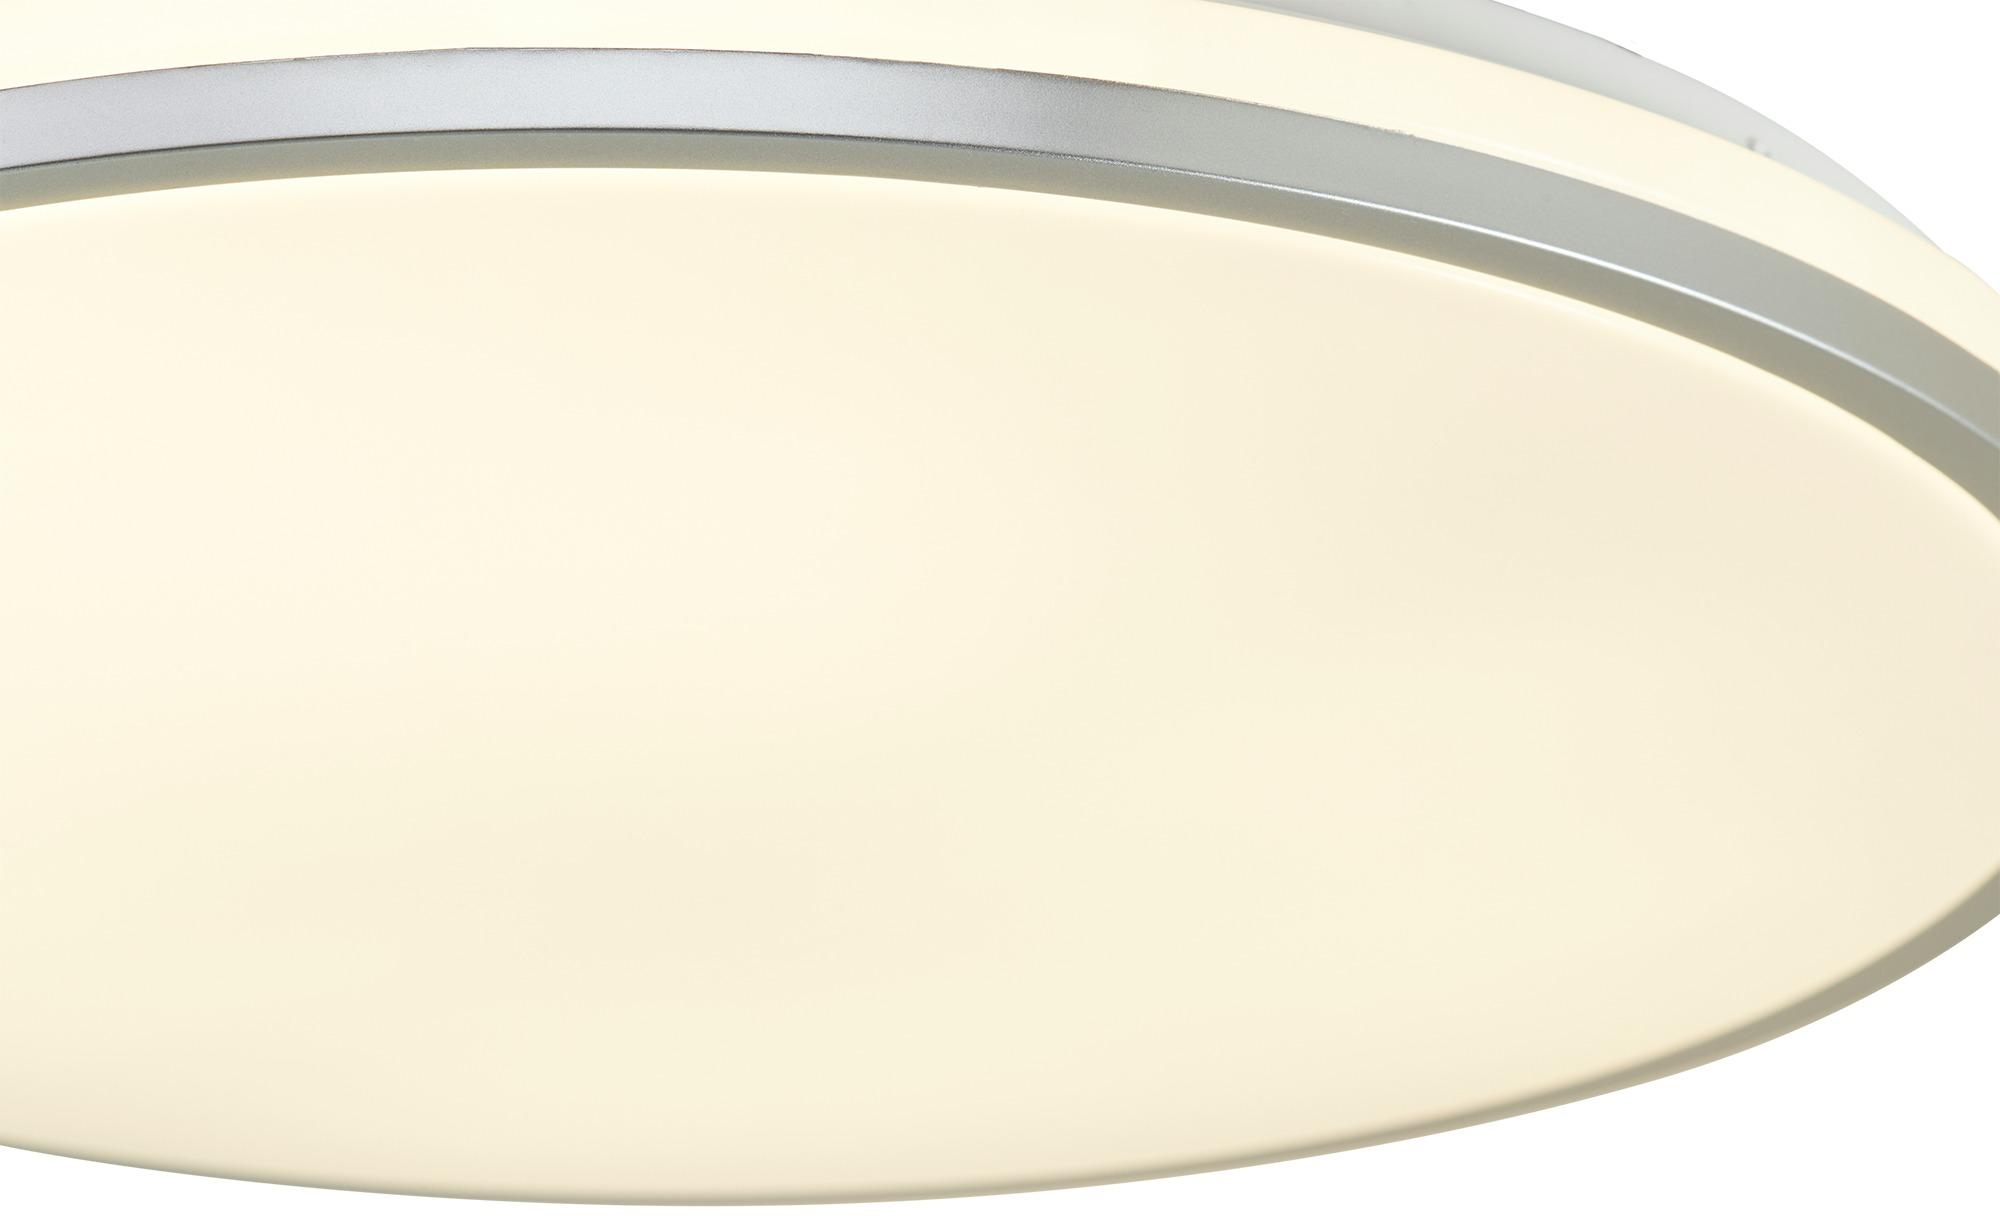 ML LED-Deckenleuchte ¦ Maße (cm): H: 6 Ø: [48.5] Lampen & Leuchten > Innenleuchten > Deckenleuchten - Höffner